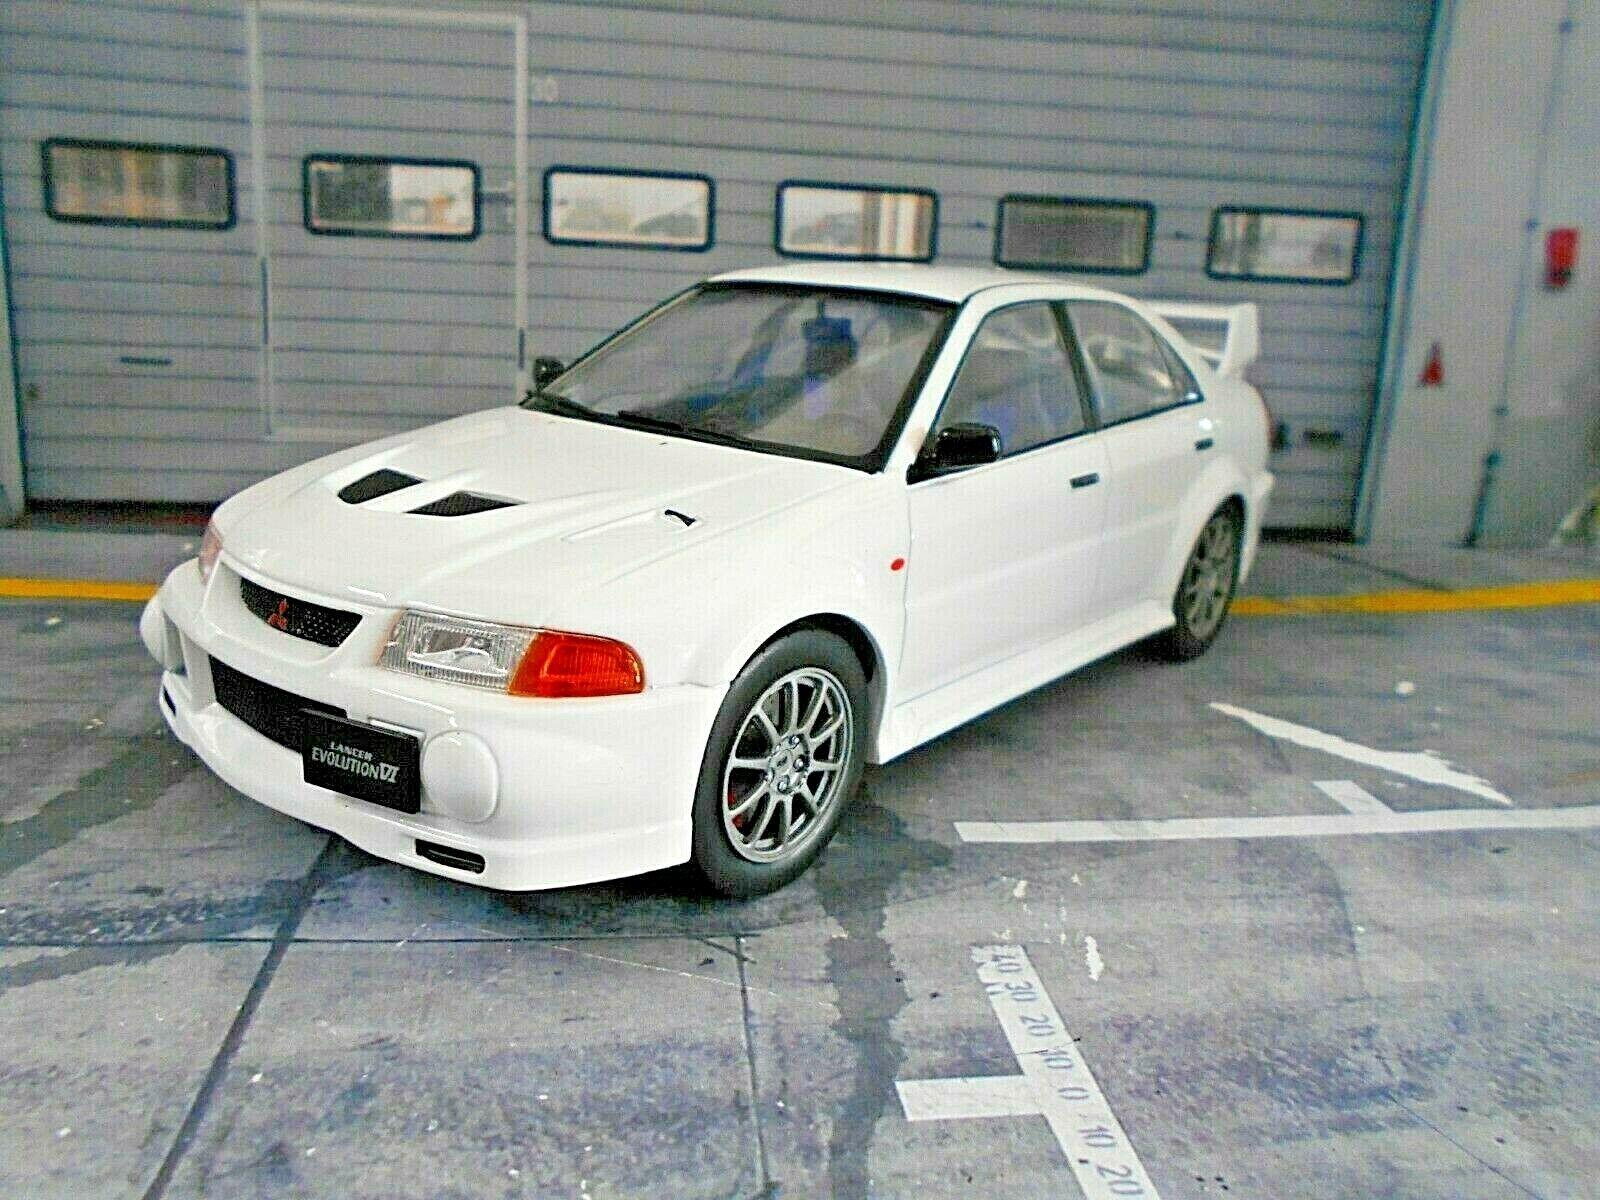 Mitsubishi Lancer EVO 6 VI rallye blanc Blanc Street 1998 IXO Nouveau New 1 18